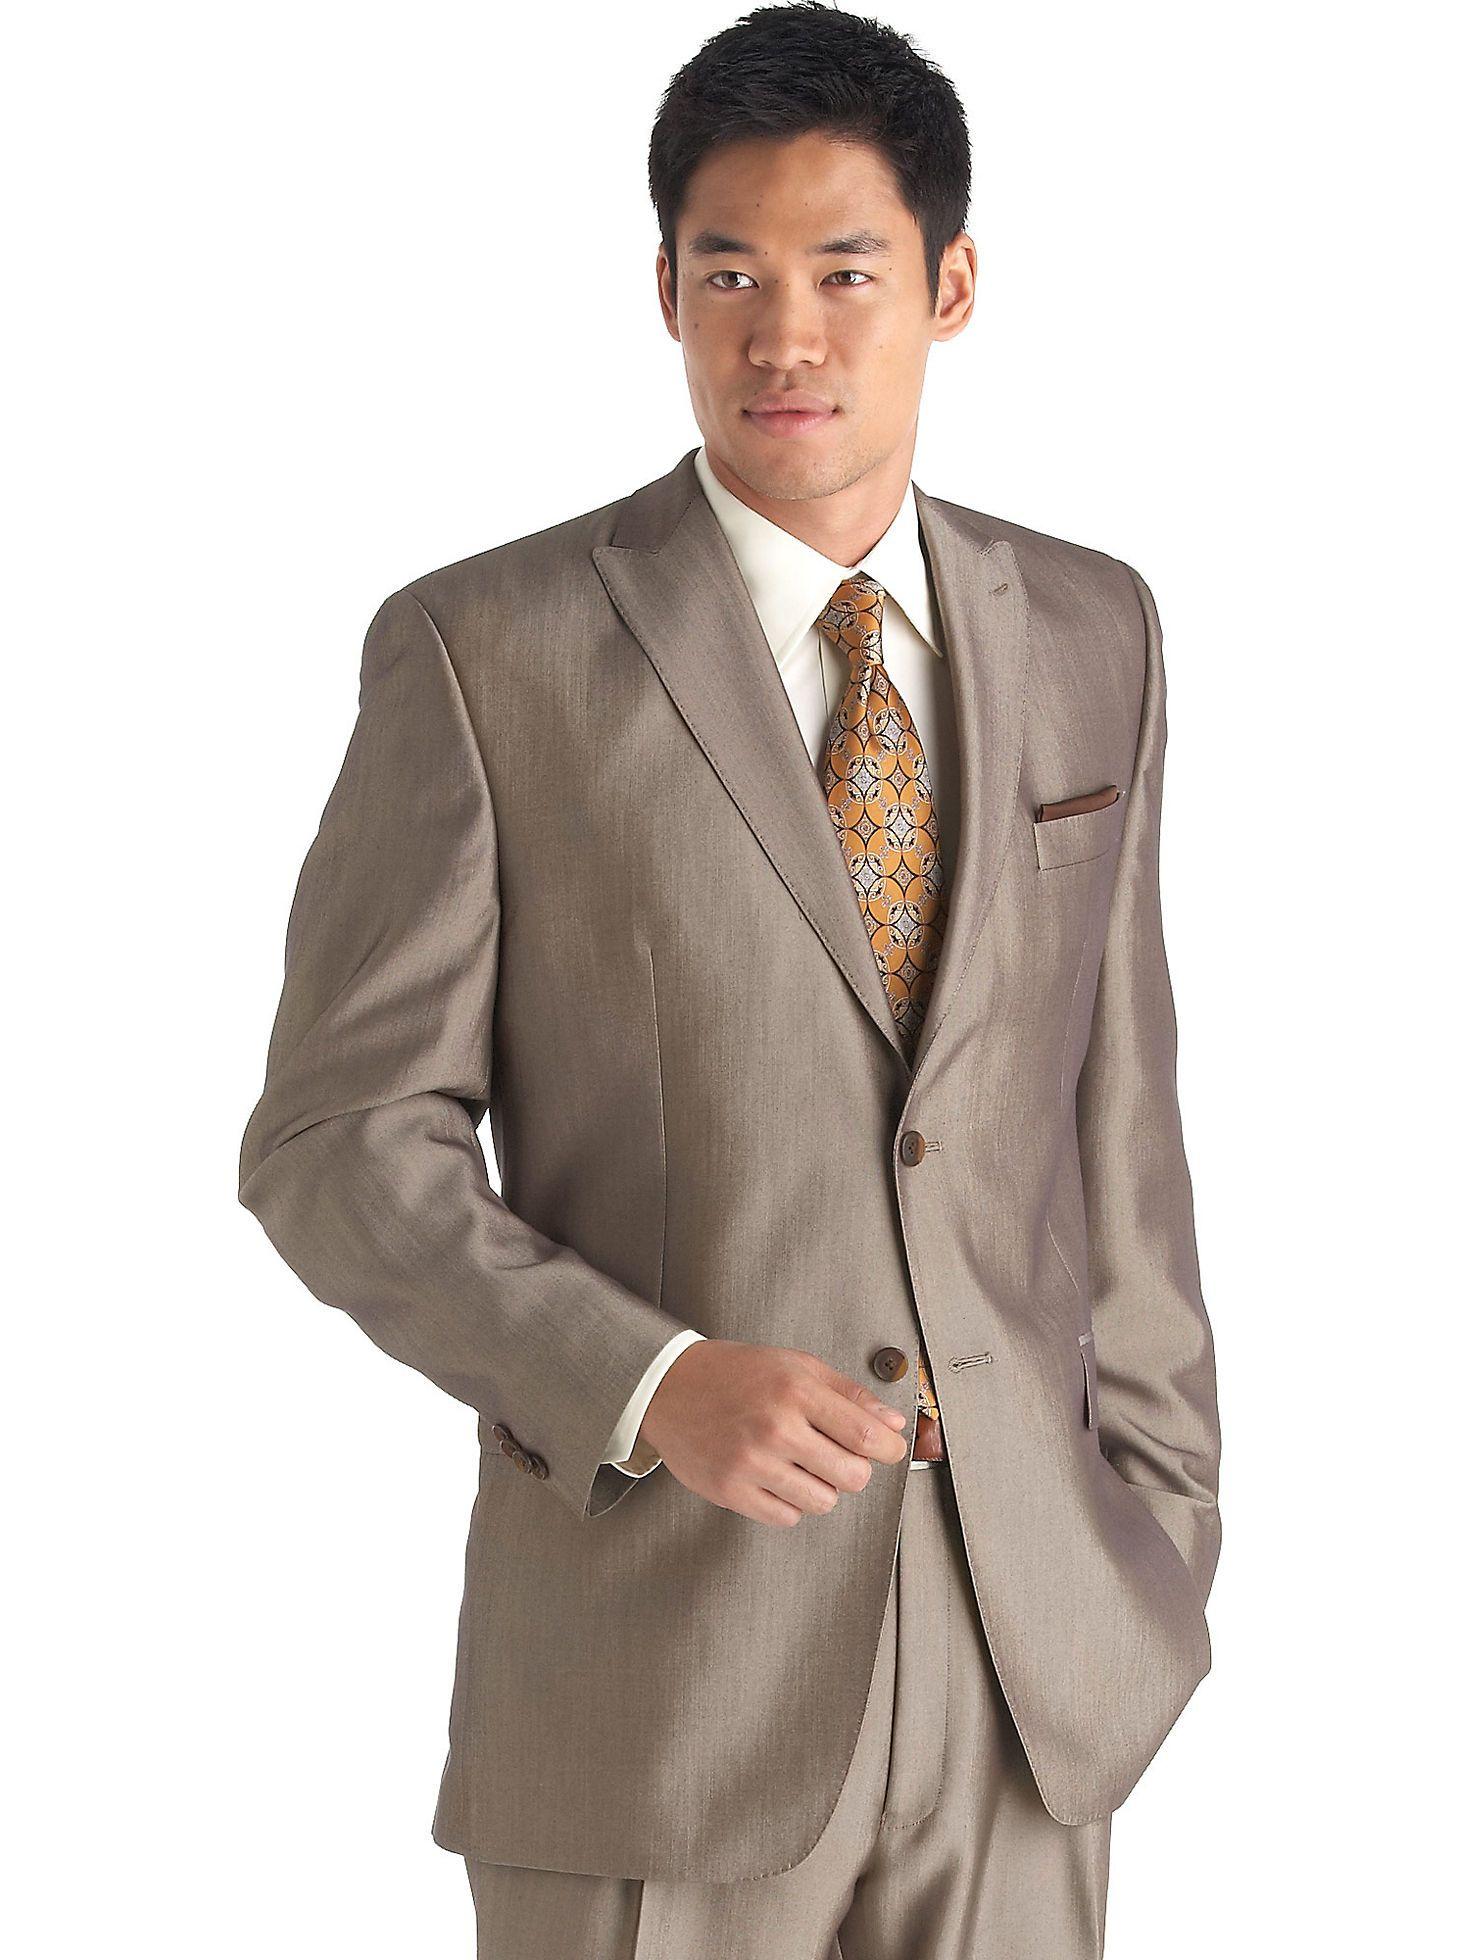 ea3e25cd9c898 Sean John Taupe Suit - Men's Wearhouse | My Style... My Fashion ...